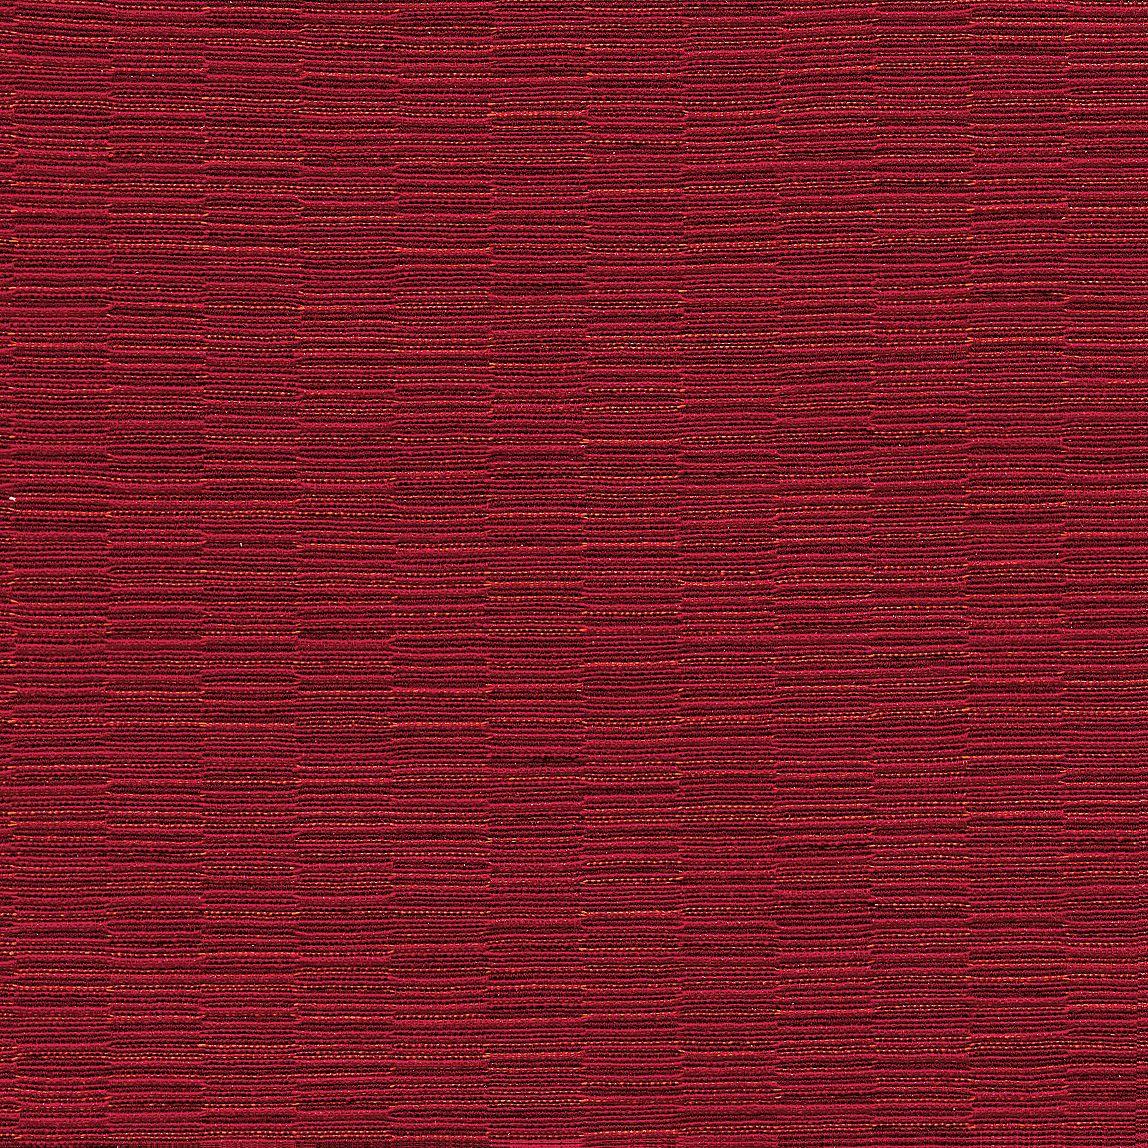 Attire Crimson Swatch